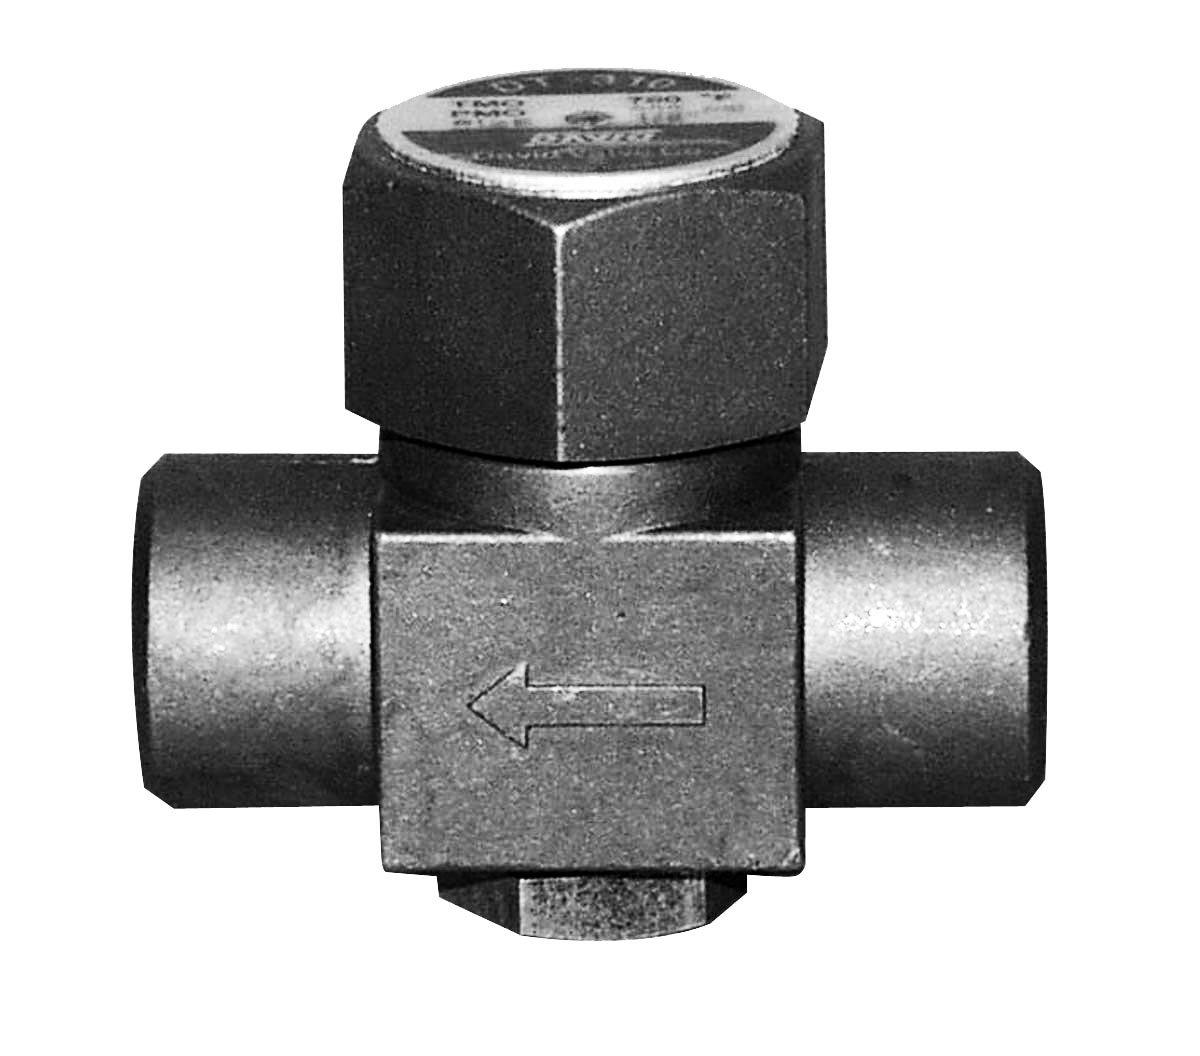 Thermodynamic Steam Trap 1/2 Inch